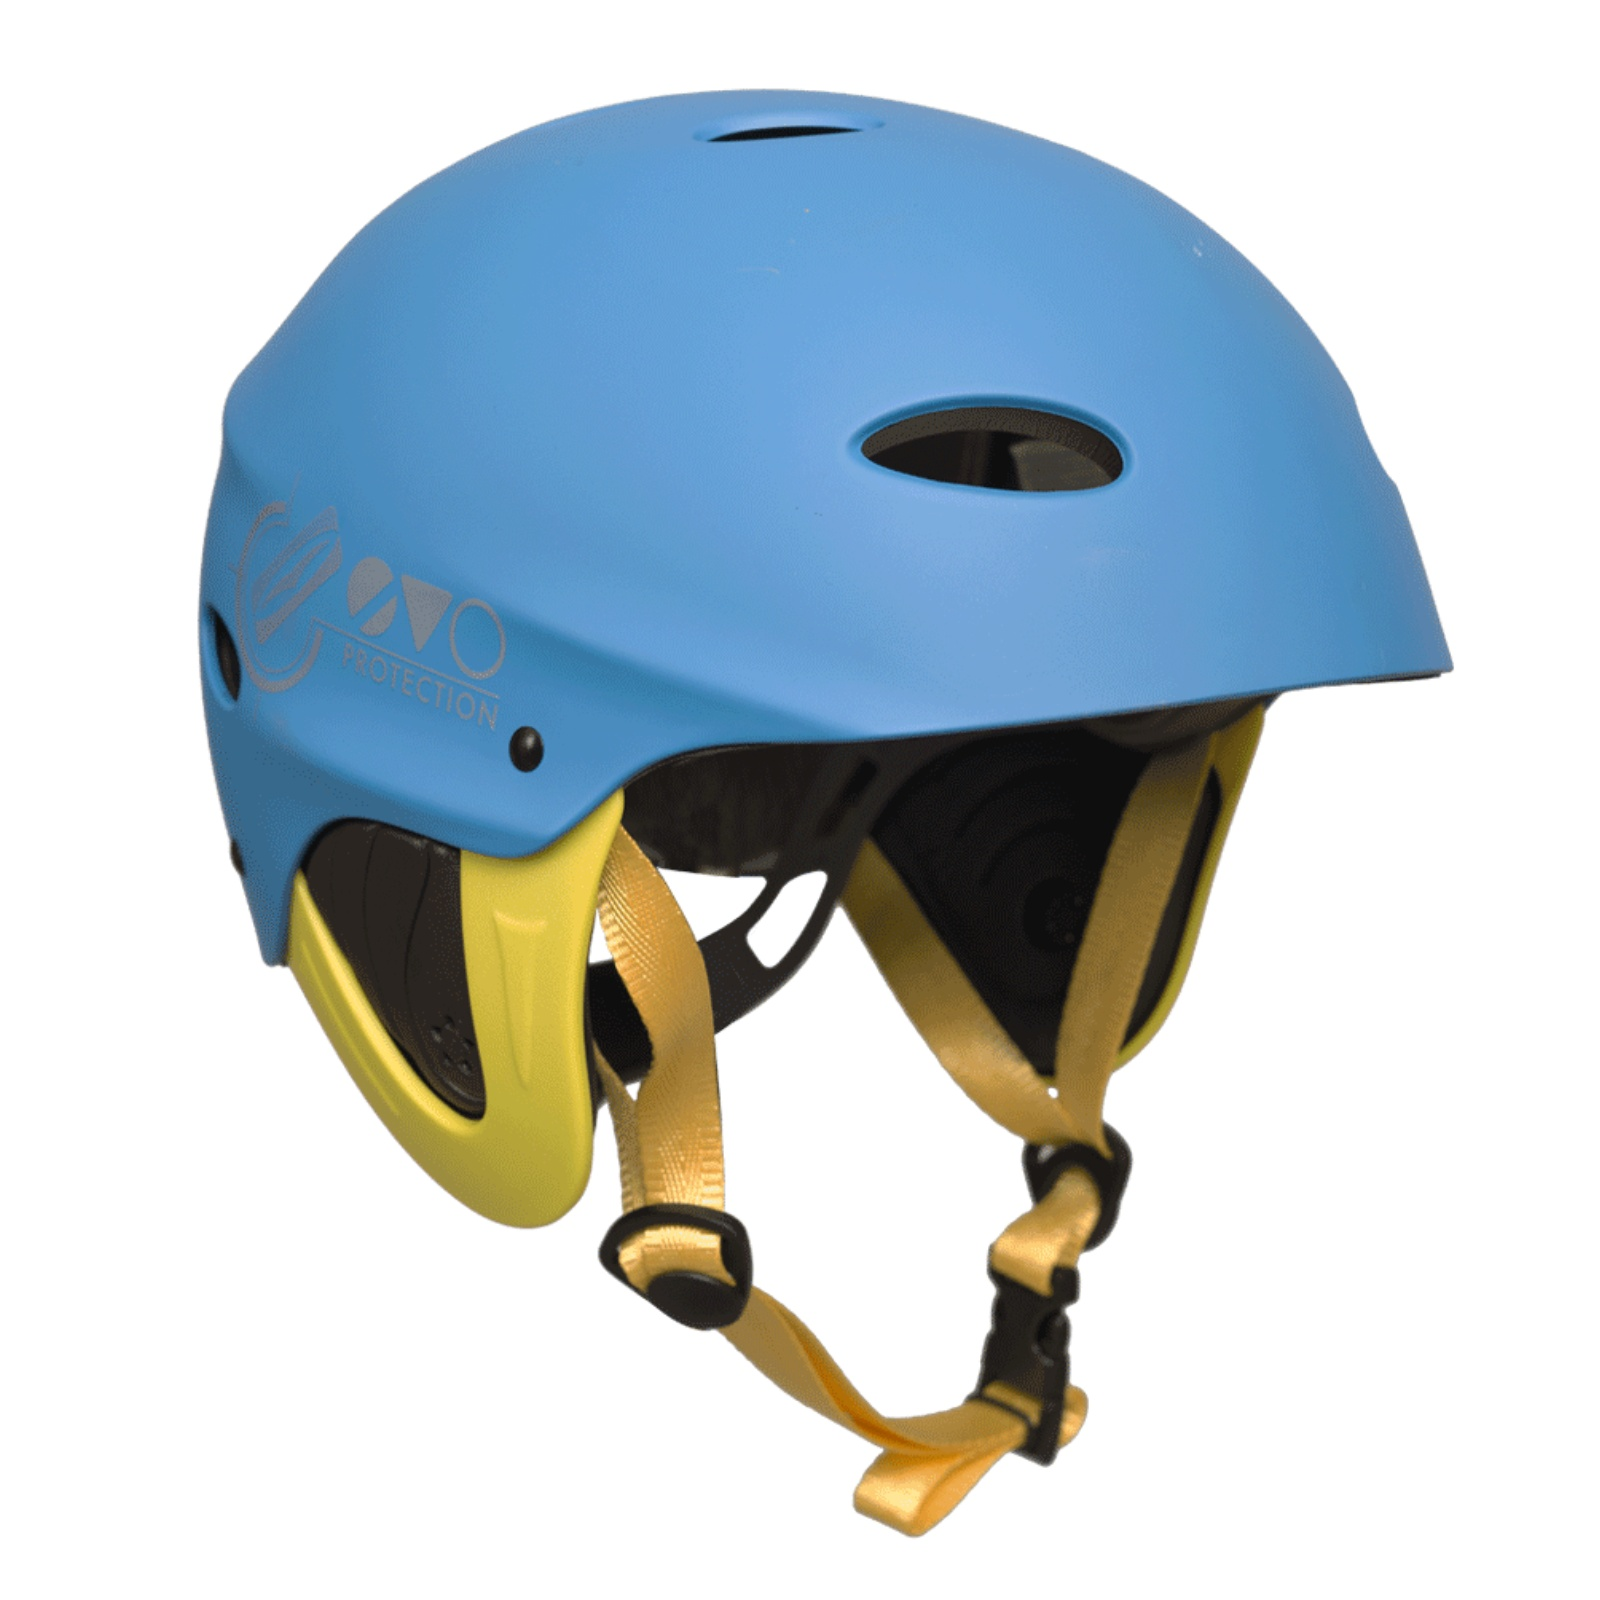 Helma GUL Evo Centre Helmet modrá